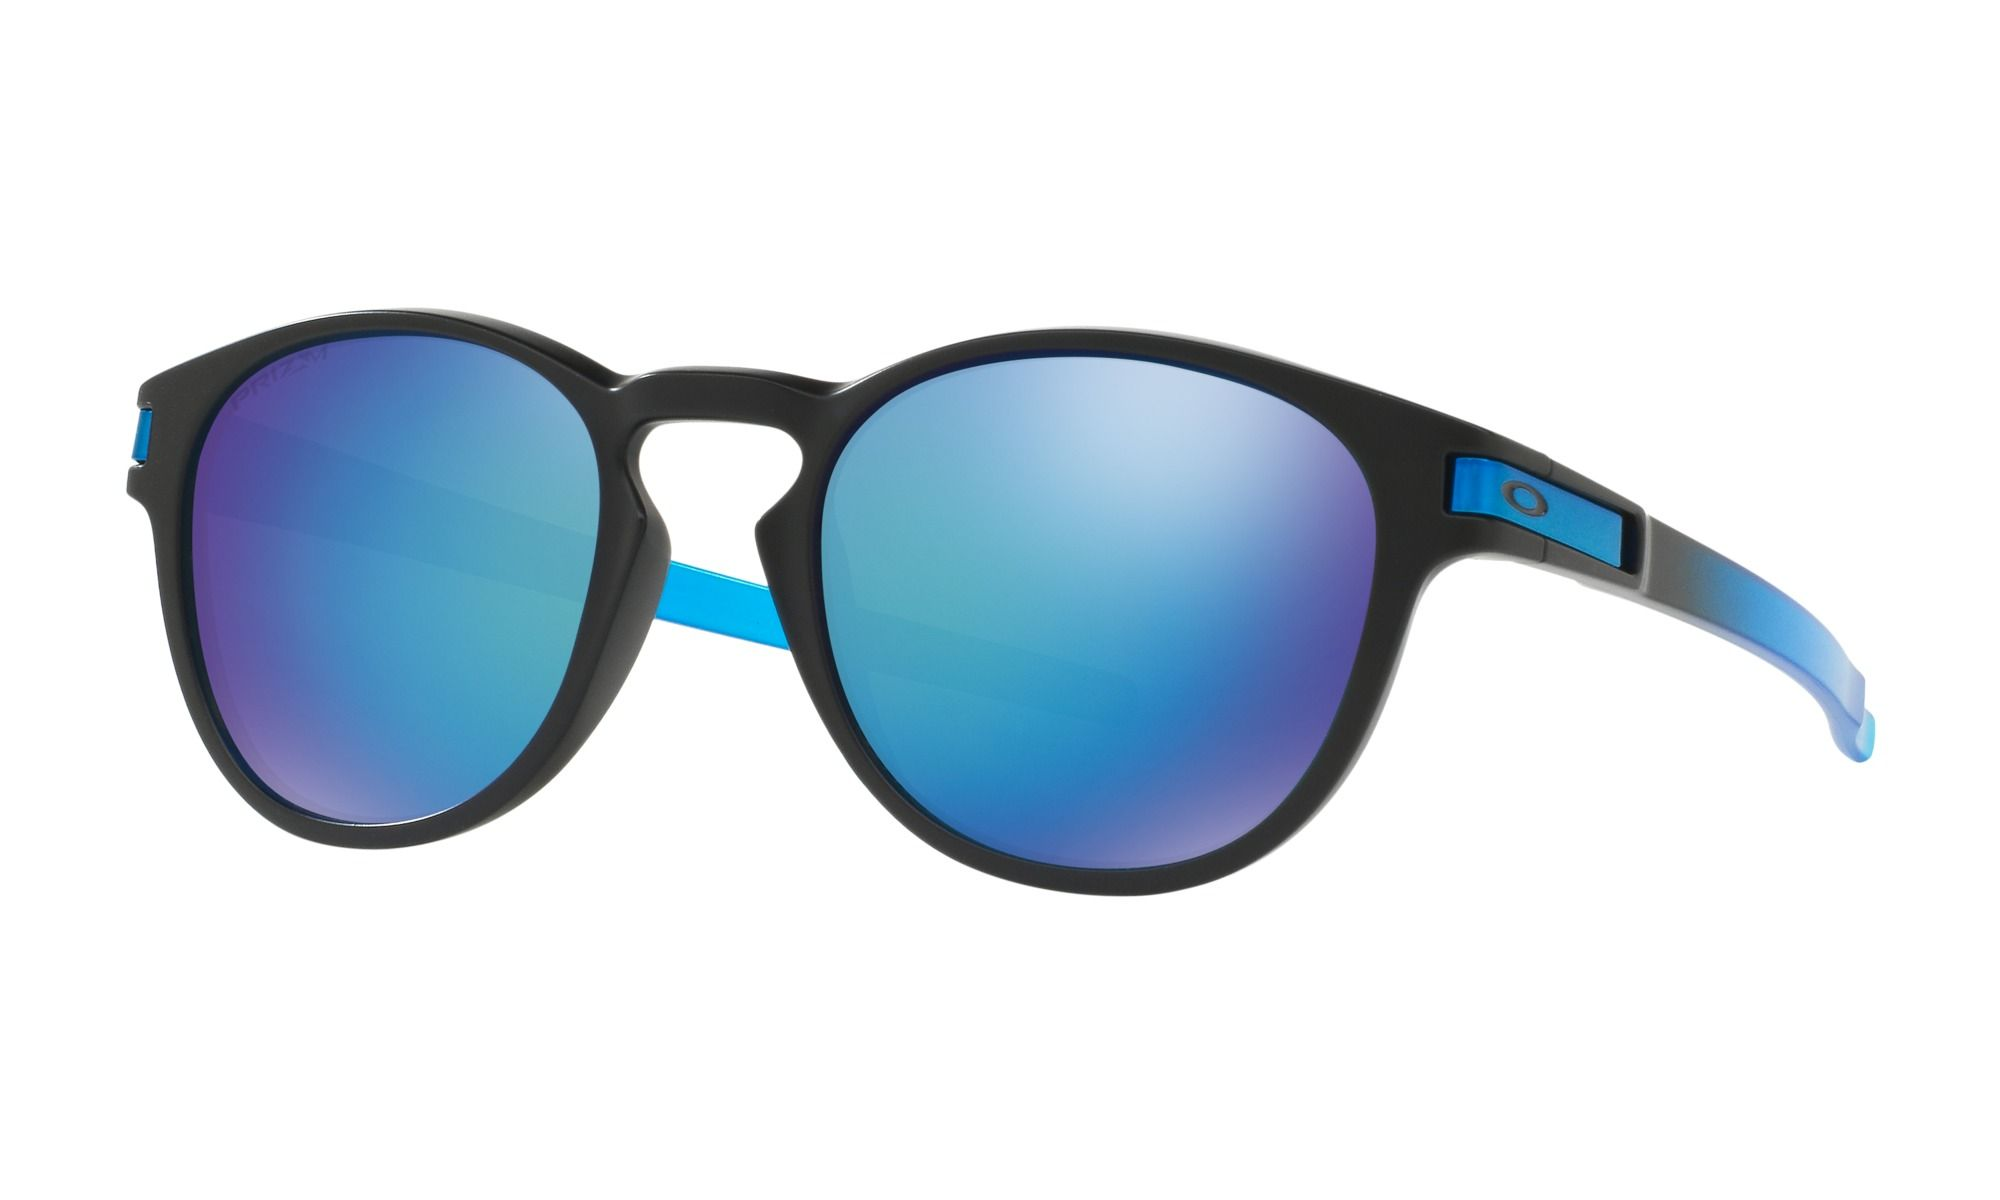 45a9bac714 Latch™ Sapphire Fade Collection - Sapphire Fade   Prizm Sapphire Polarized